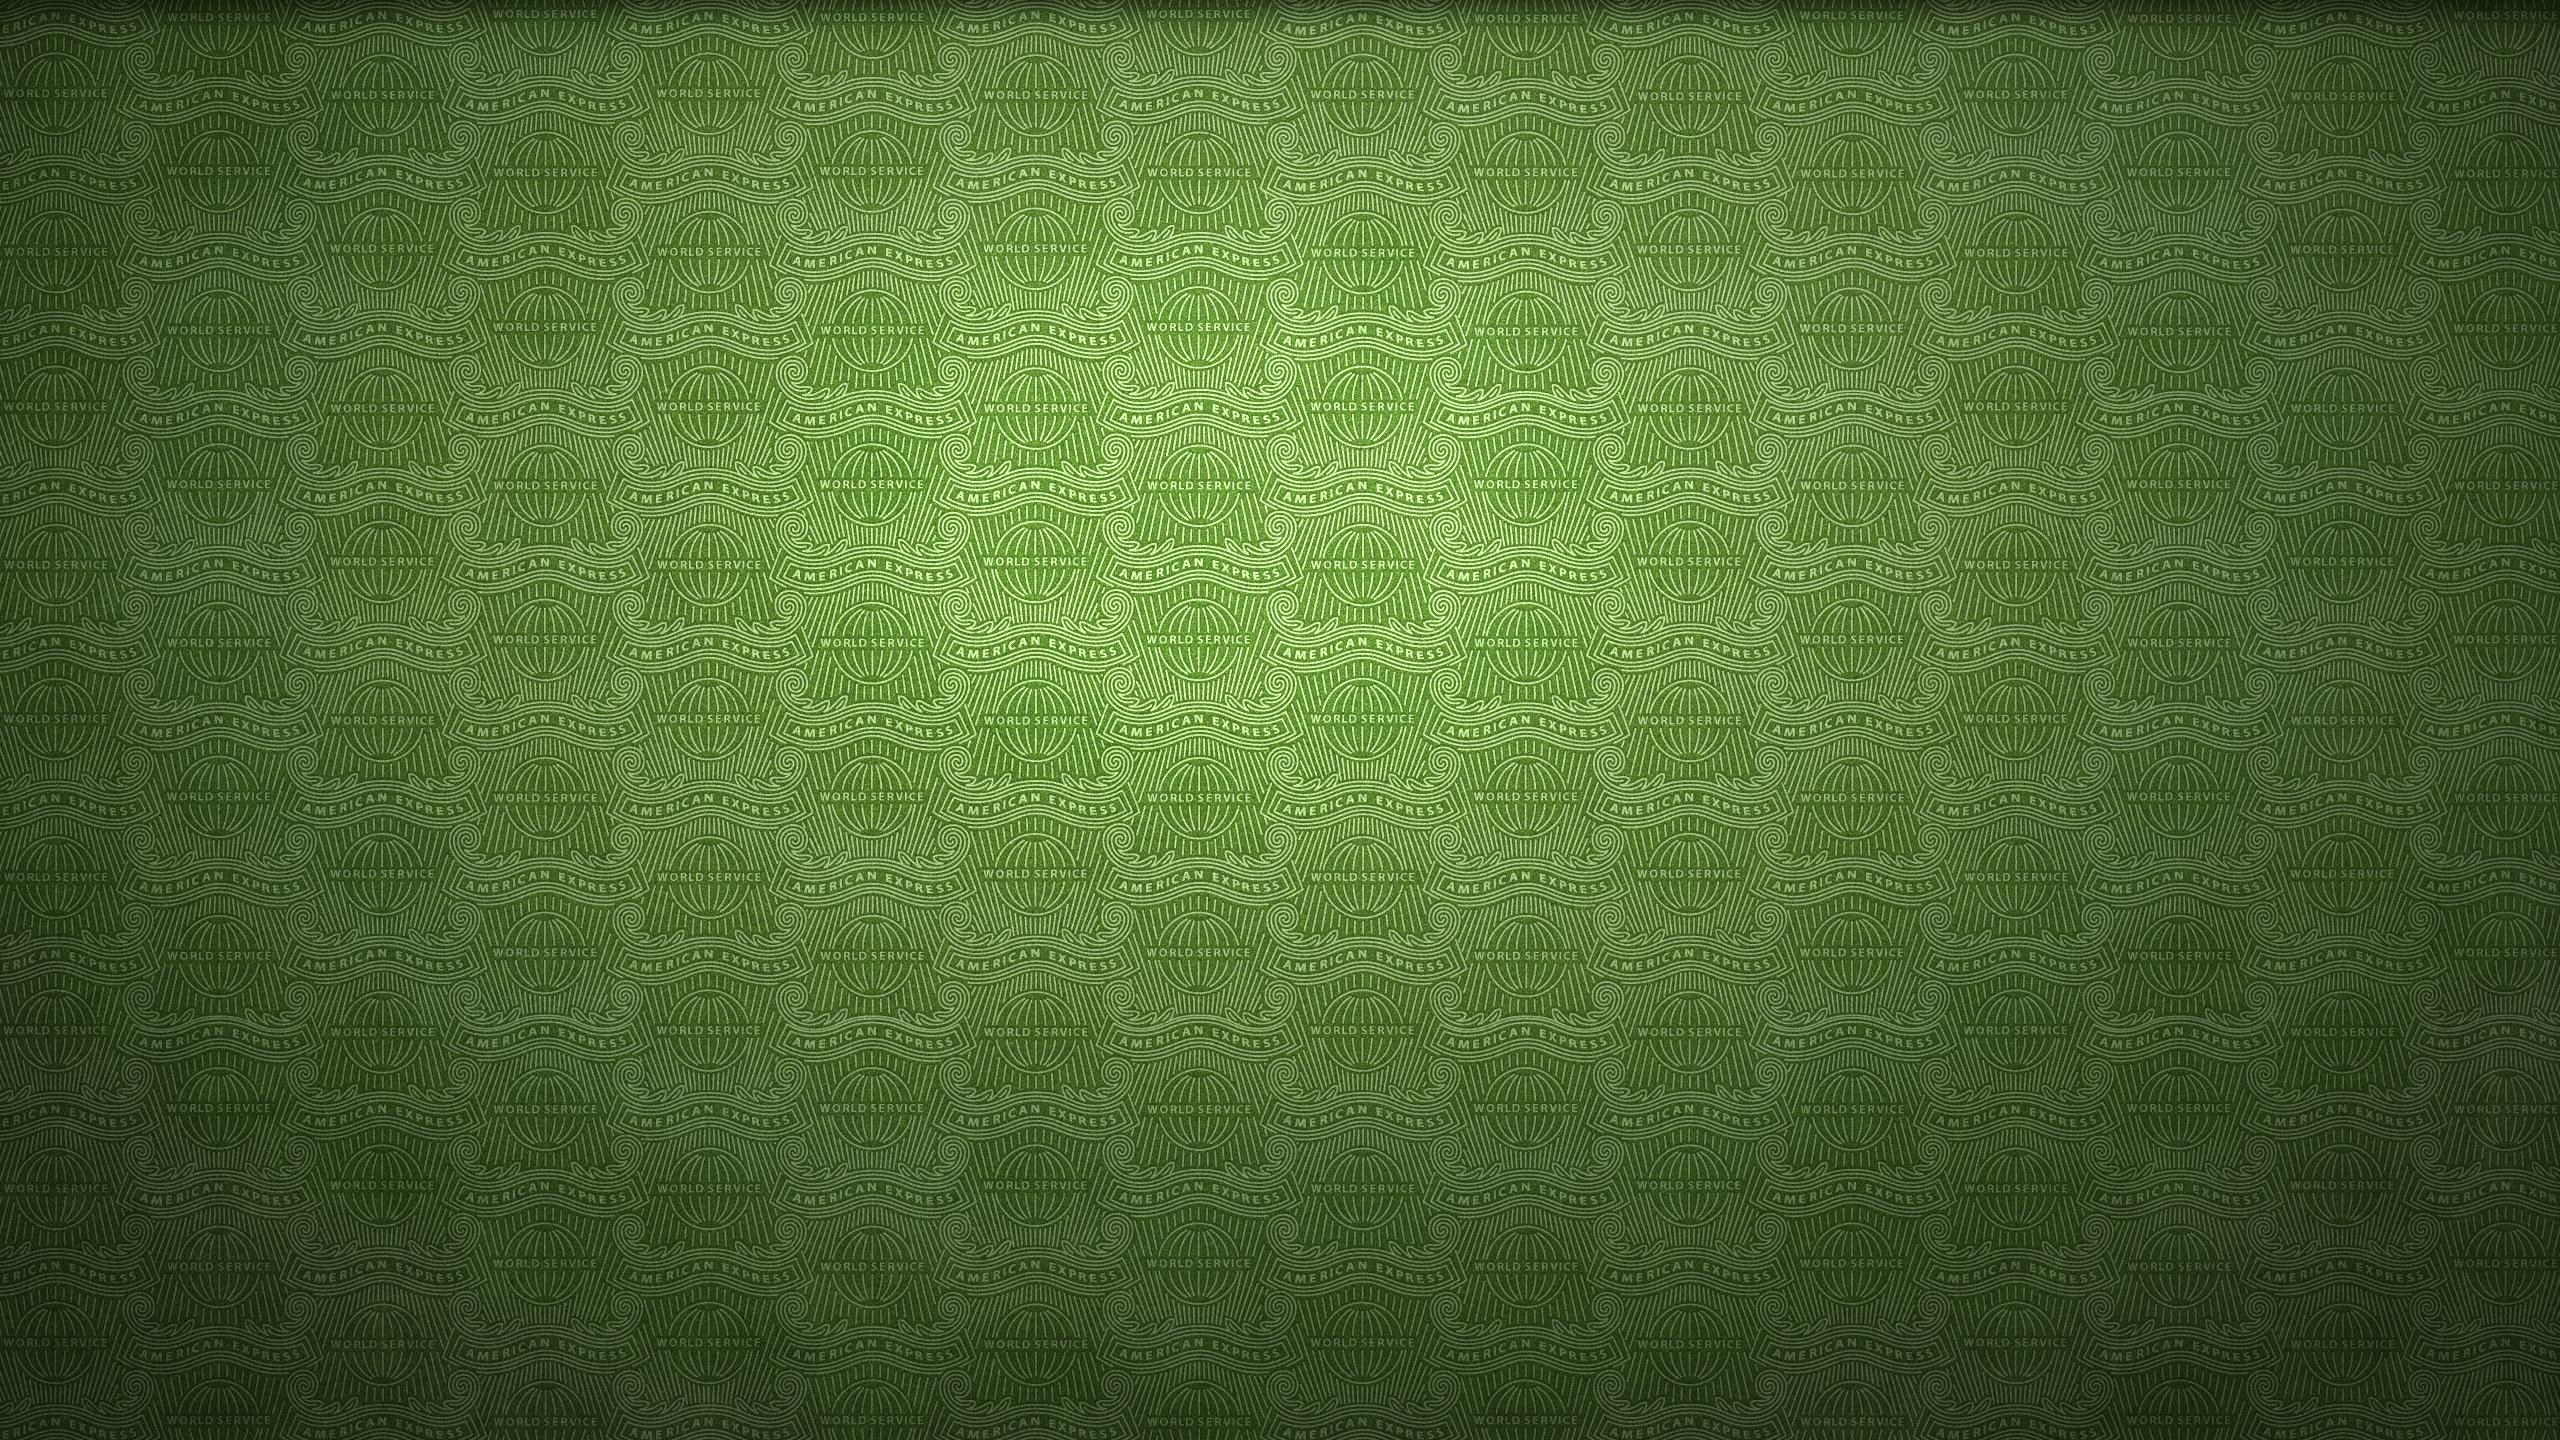 American Express Wallpaper 2560x1440